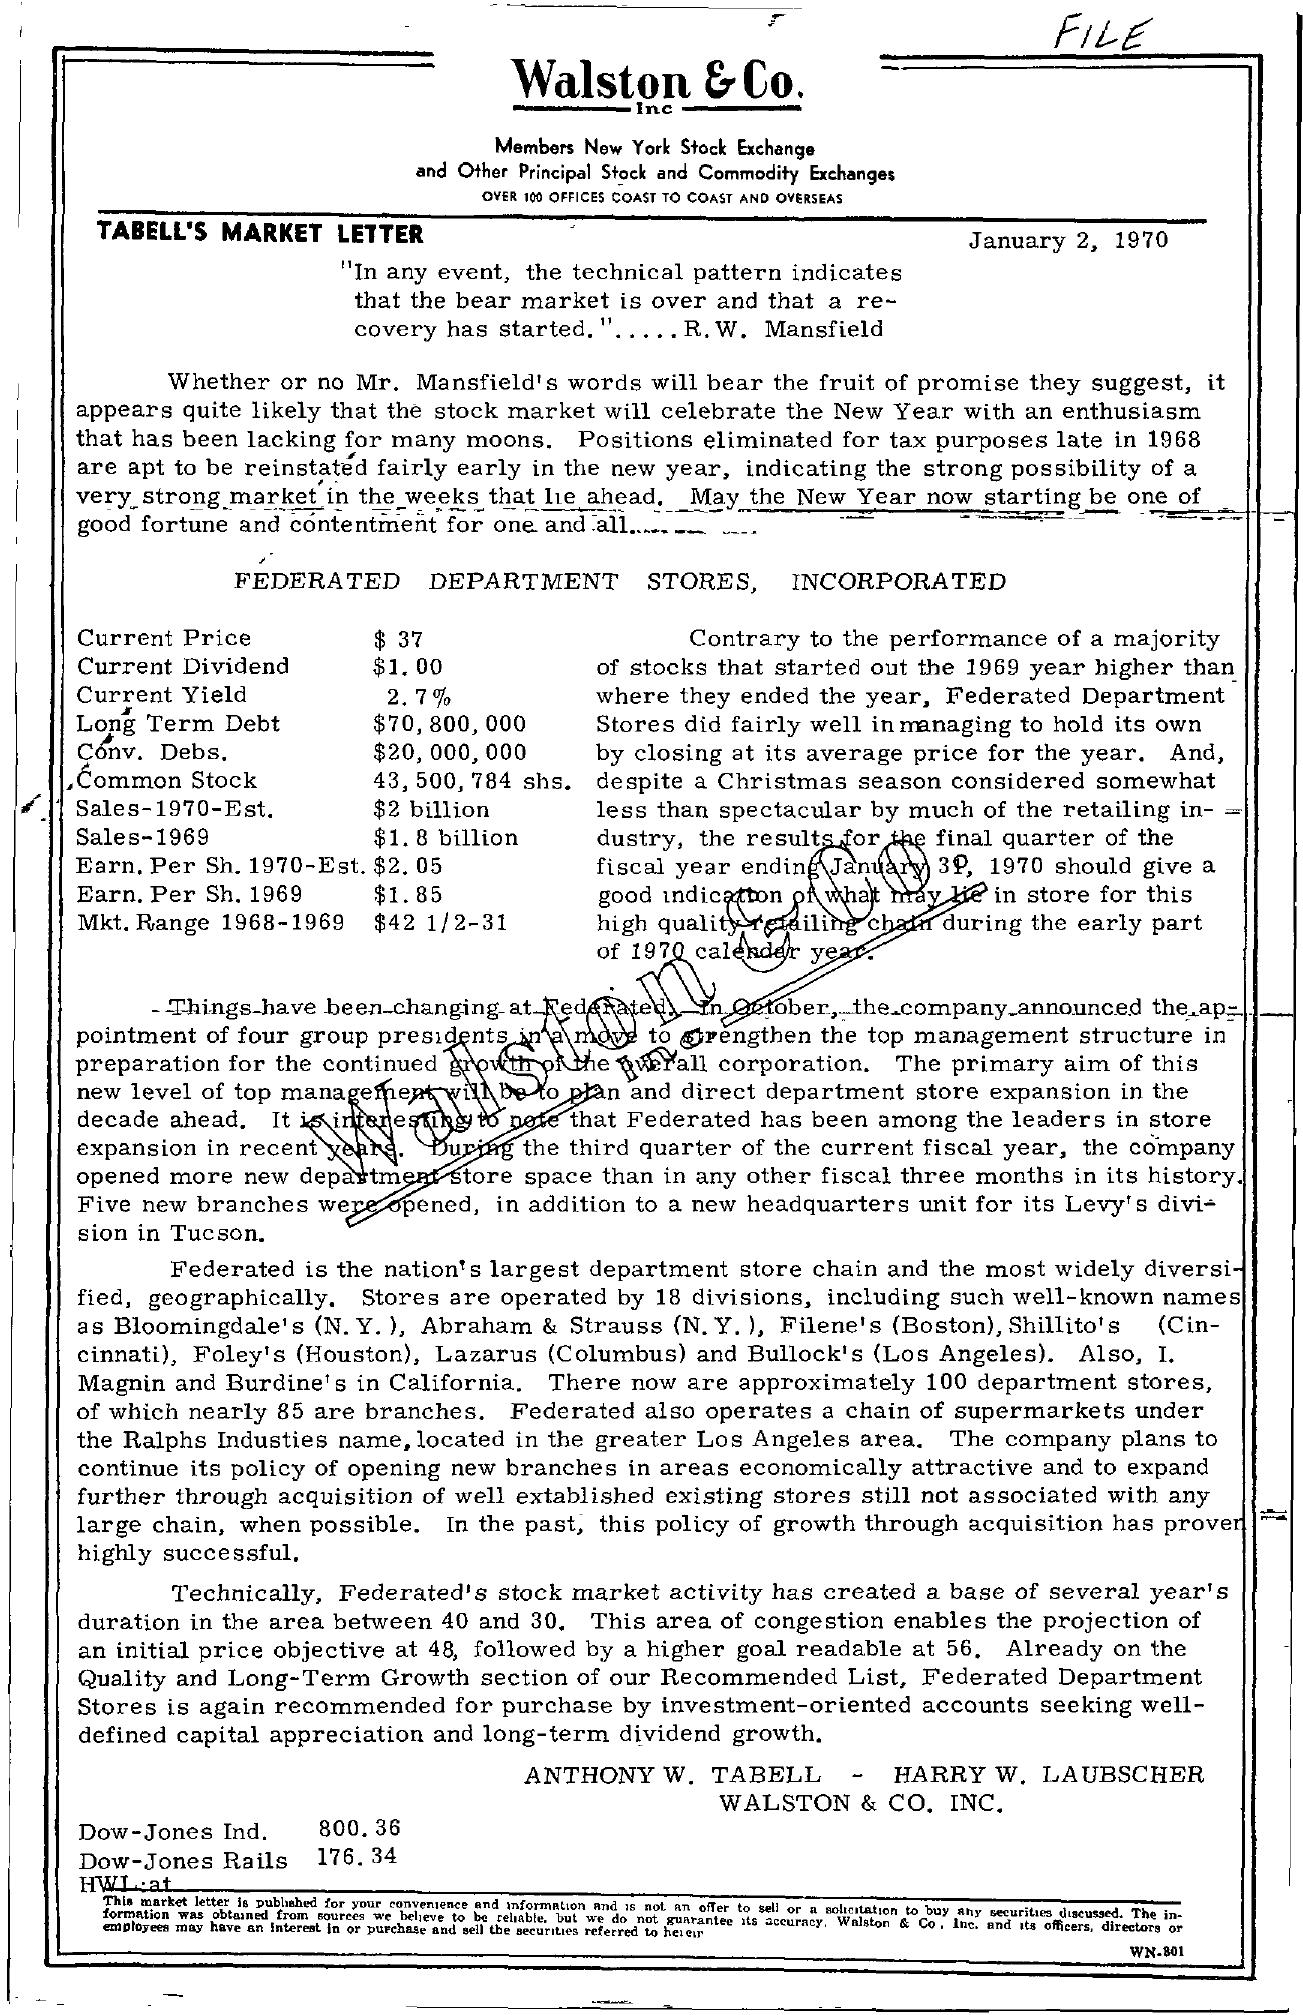 Tabell's Market Letter - January 02, 1970